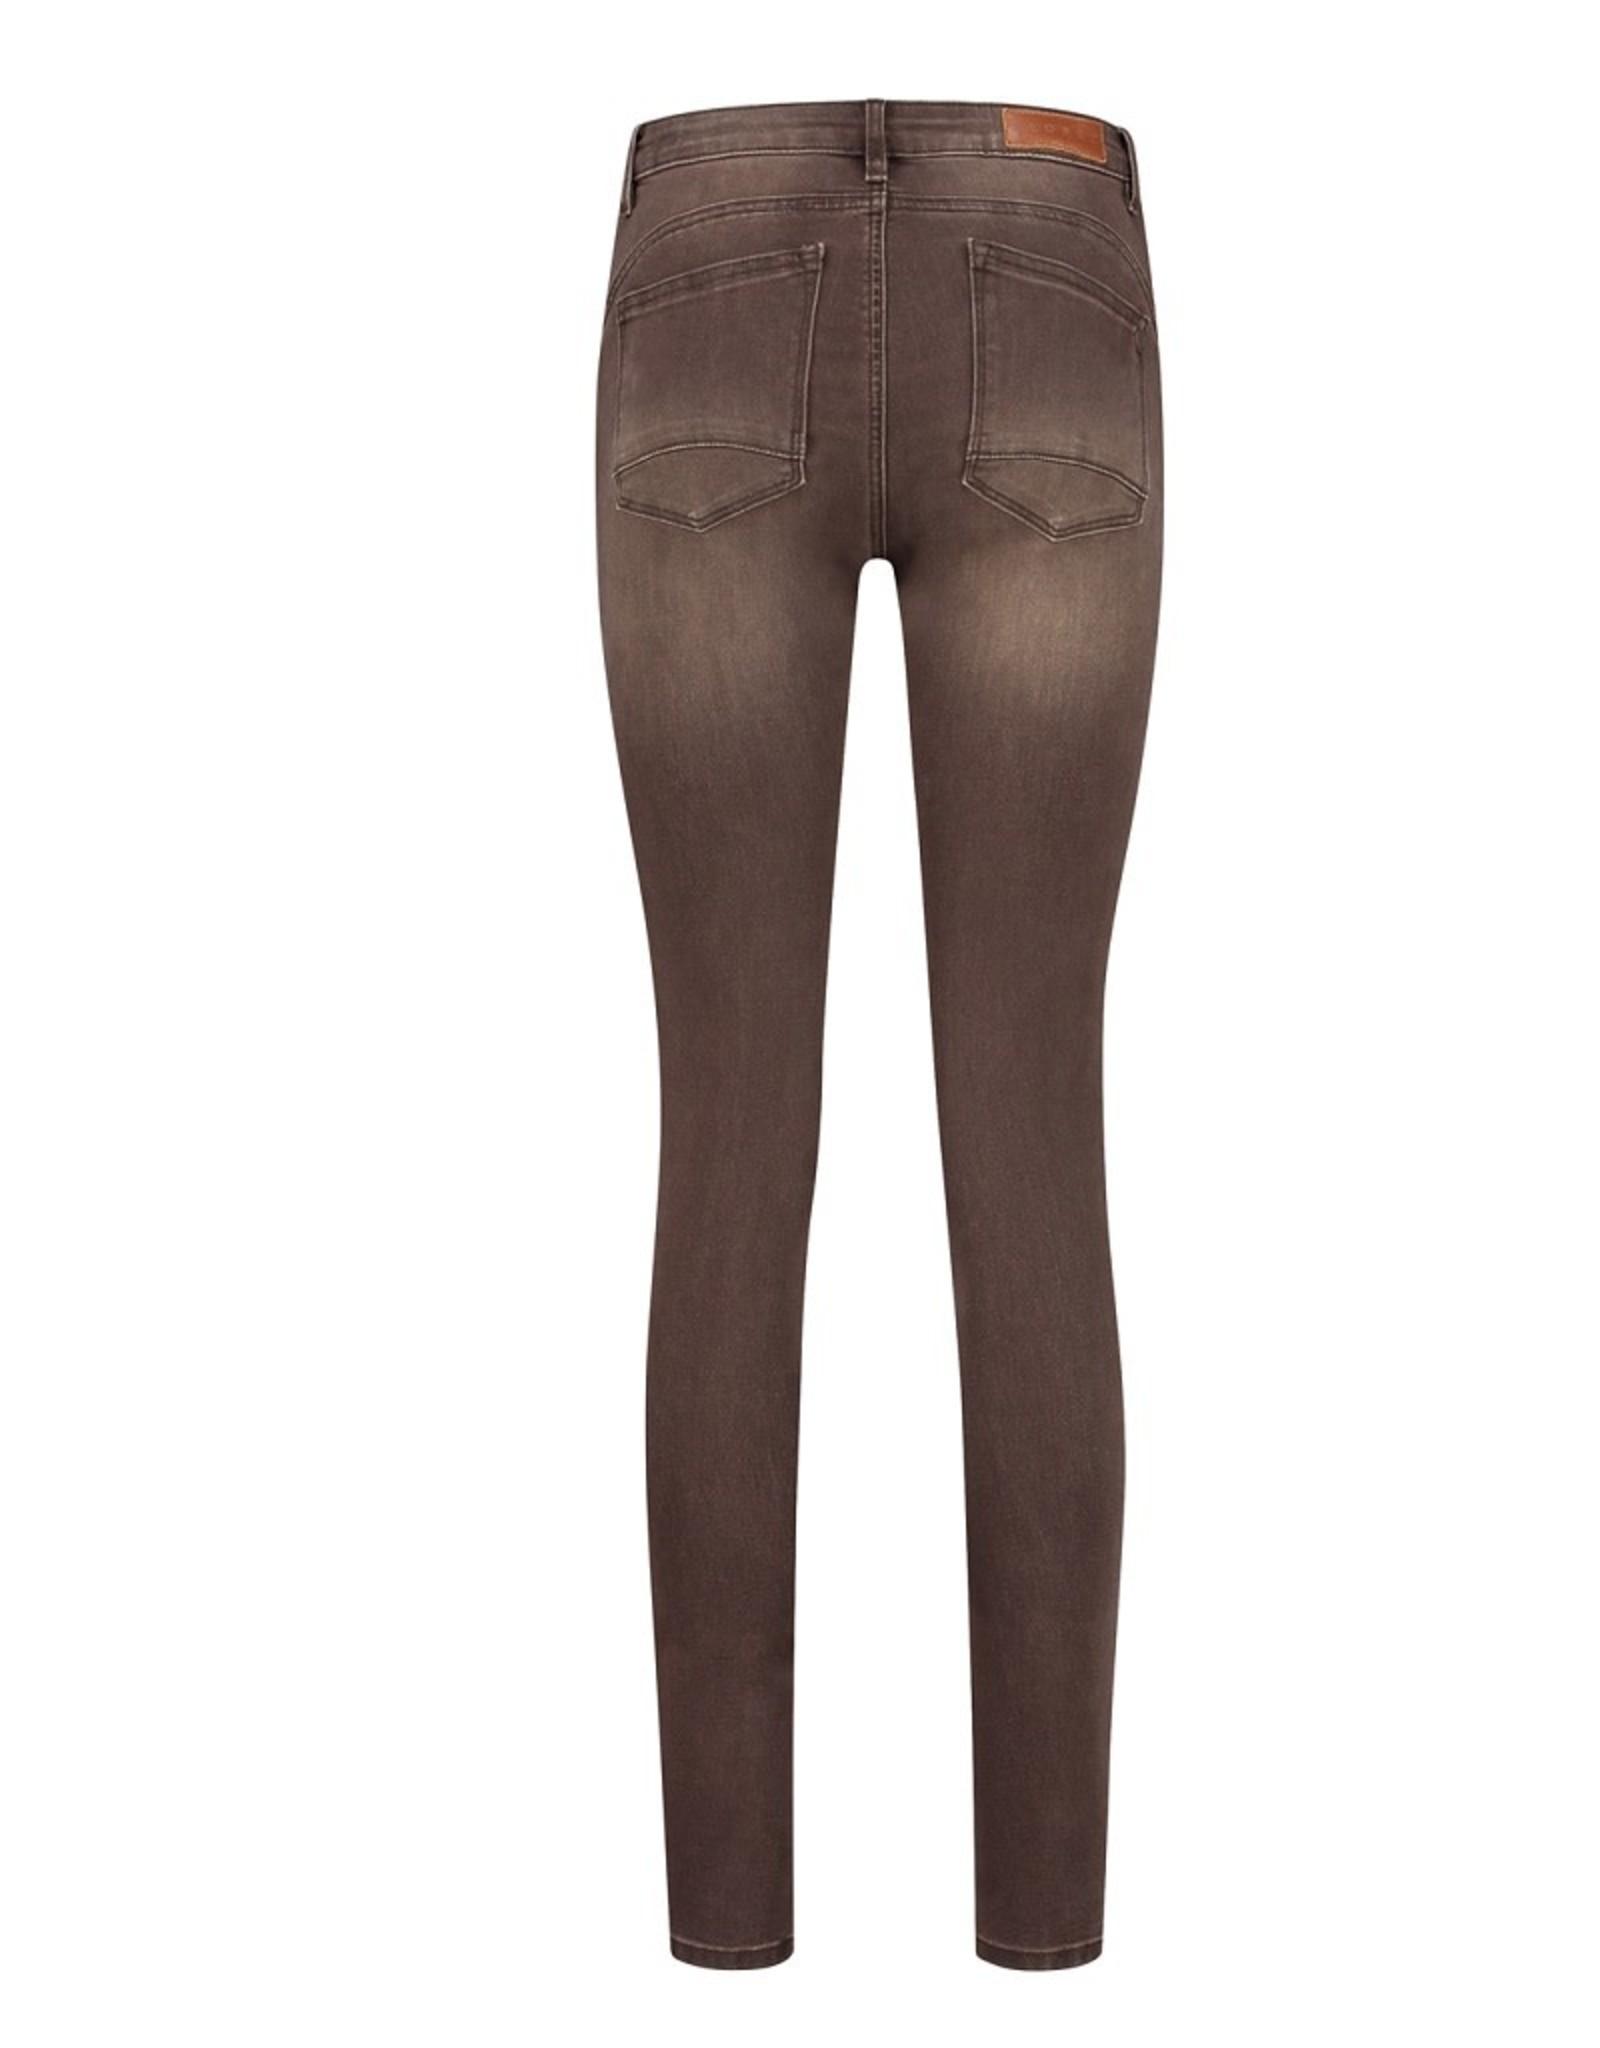 Florèz Florez Charmeur jeans Zipper brown